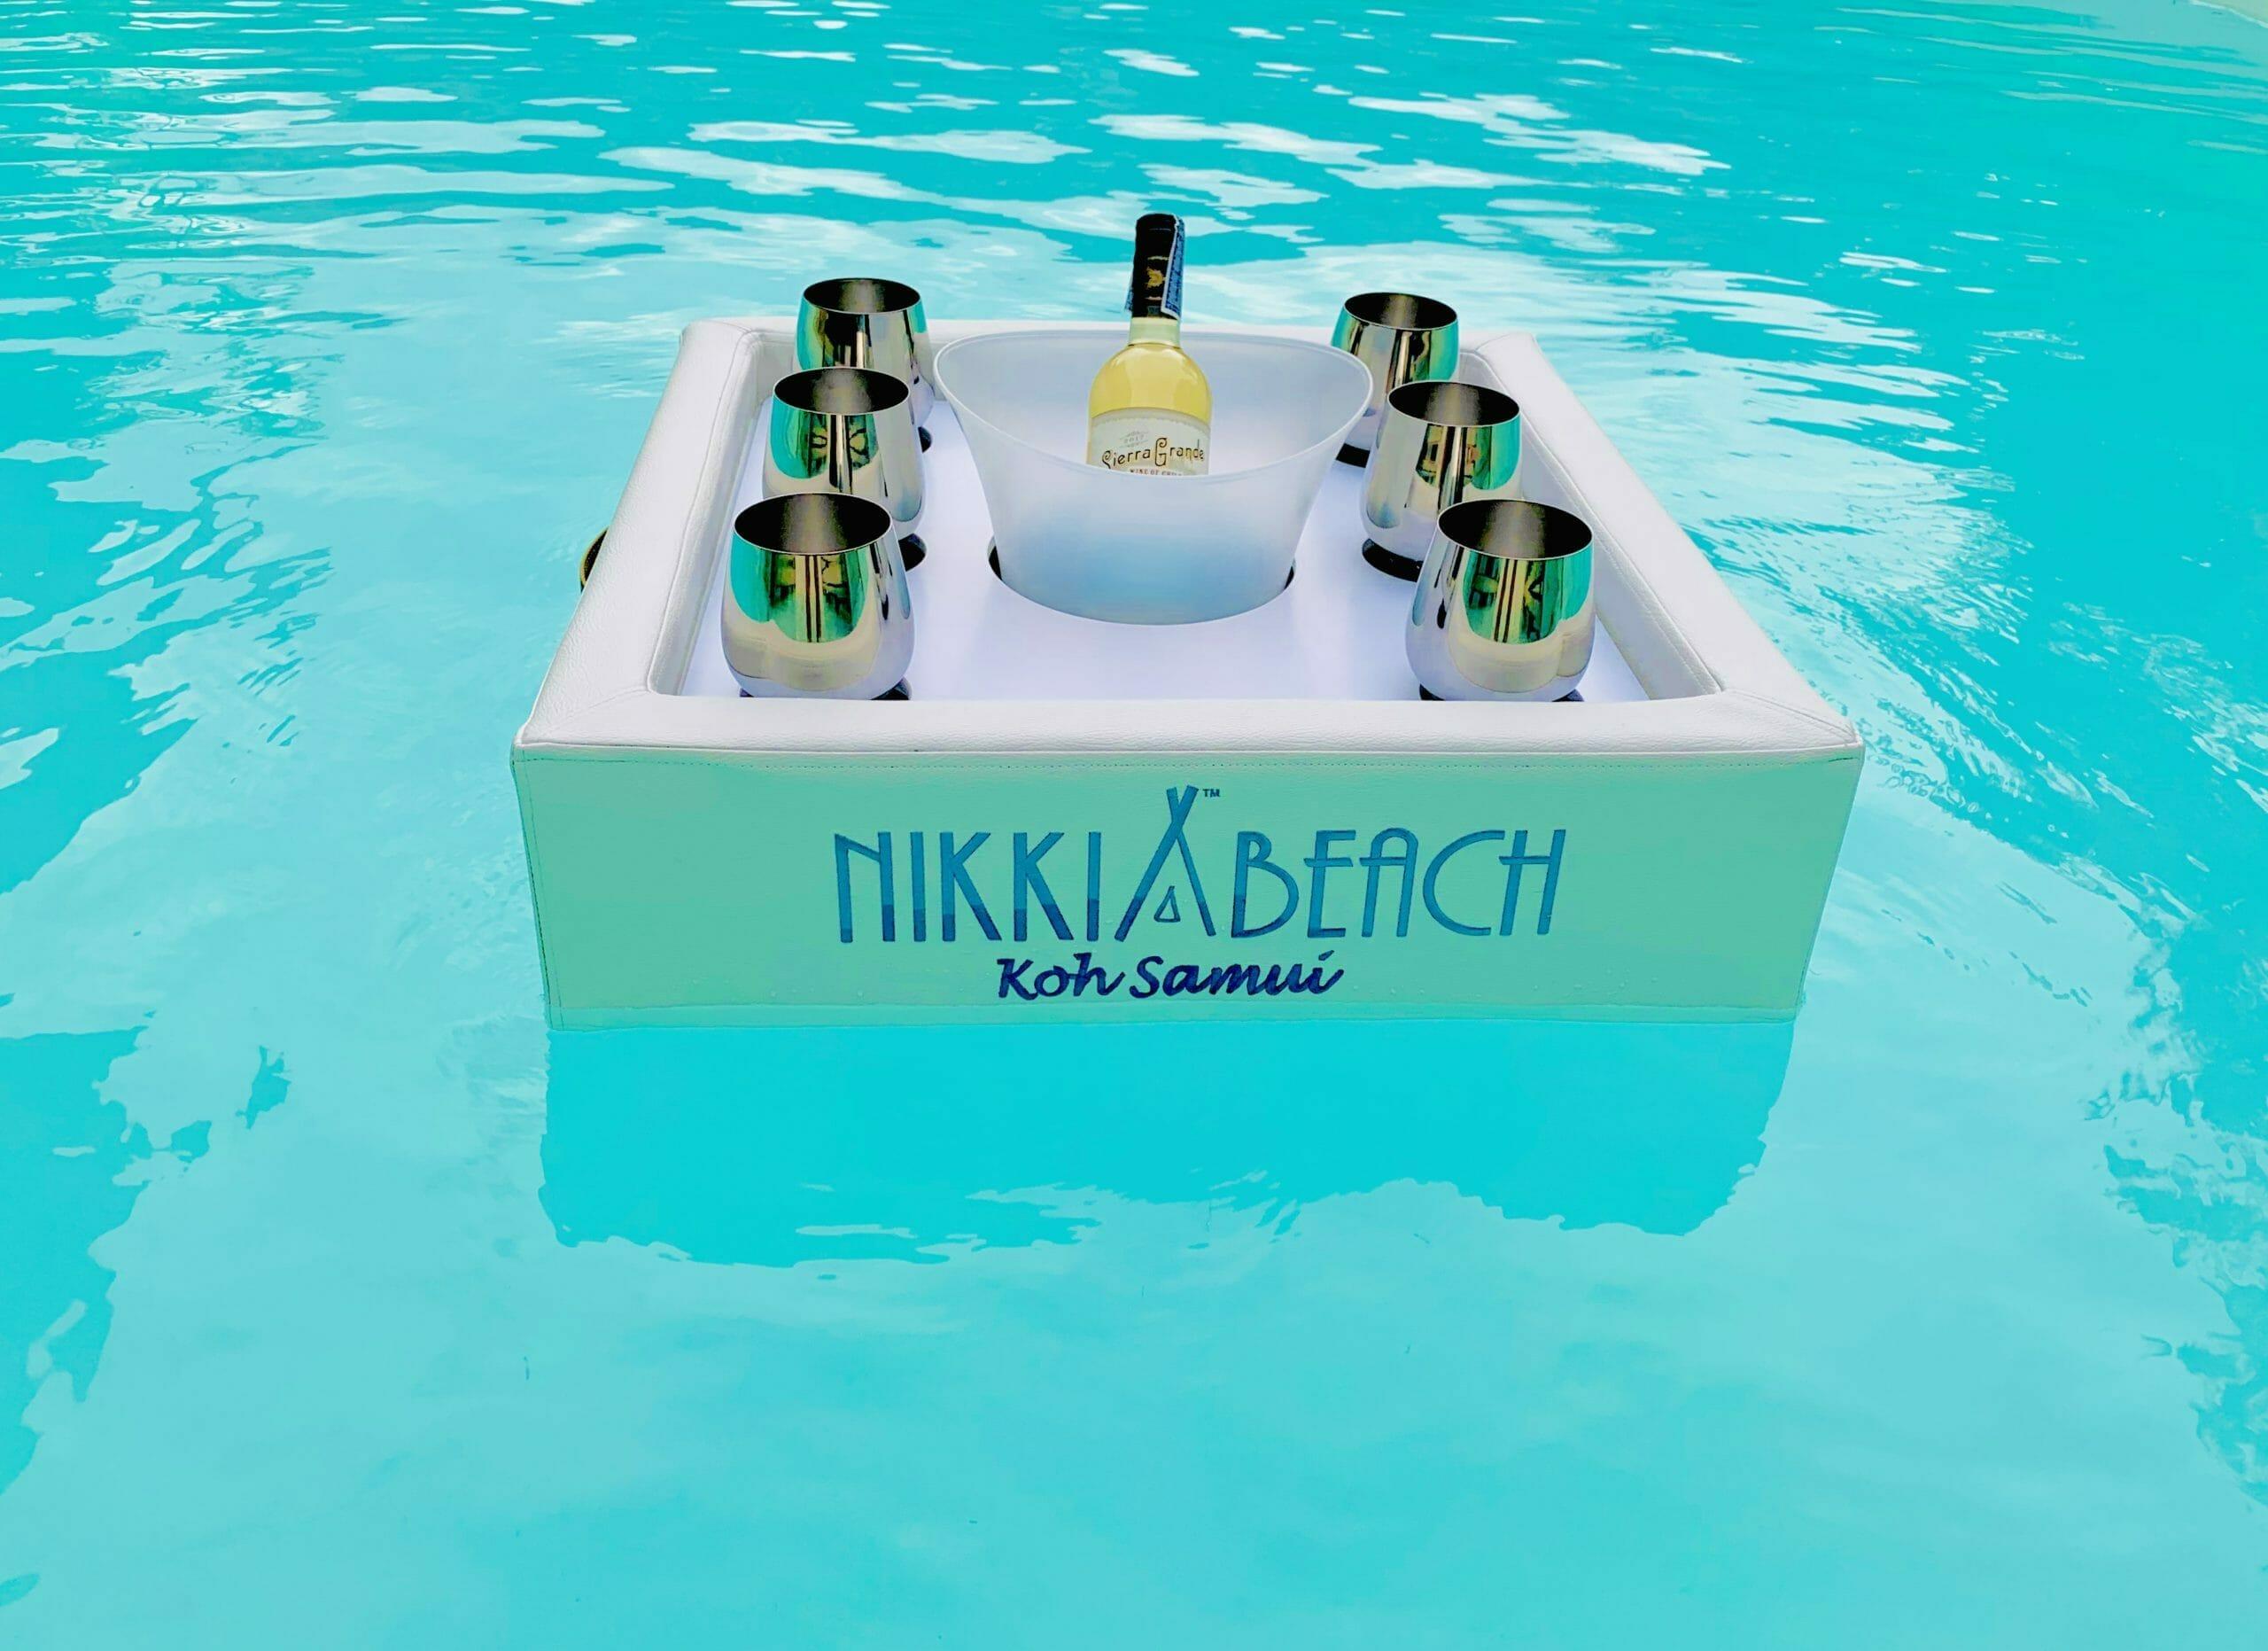 Nikki Beach Koh Samui